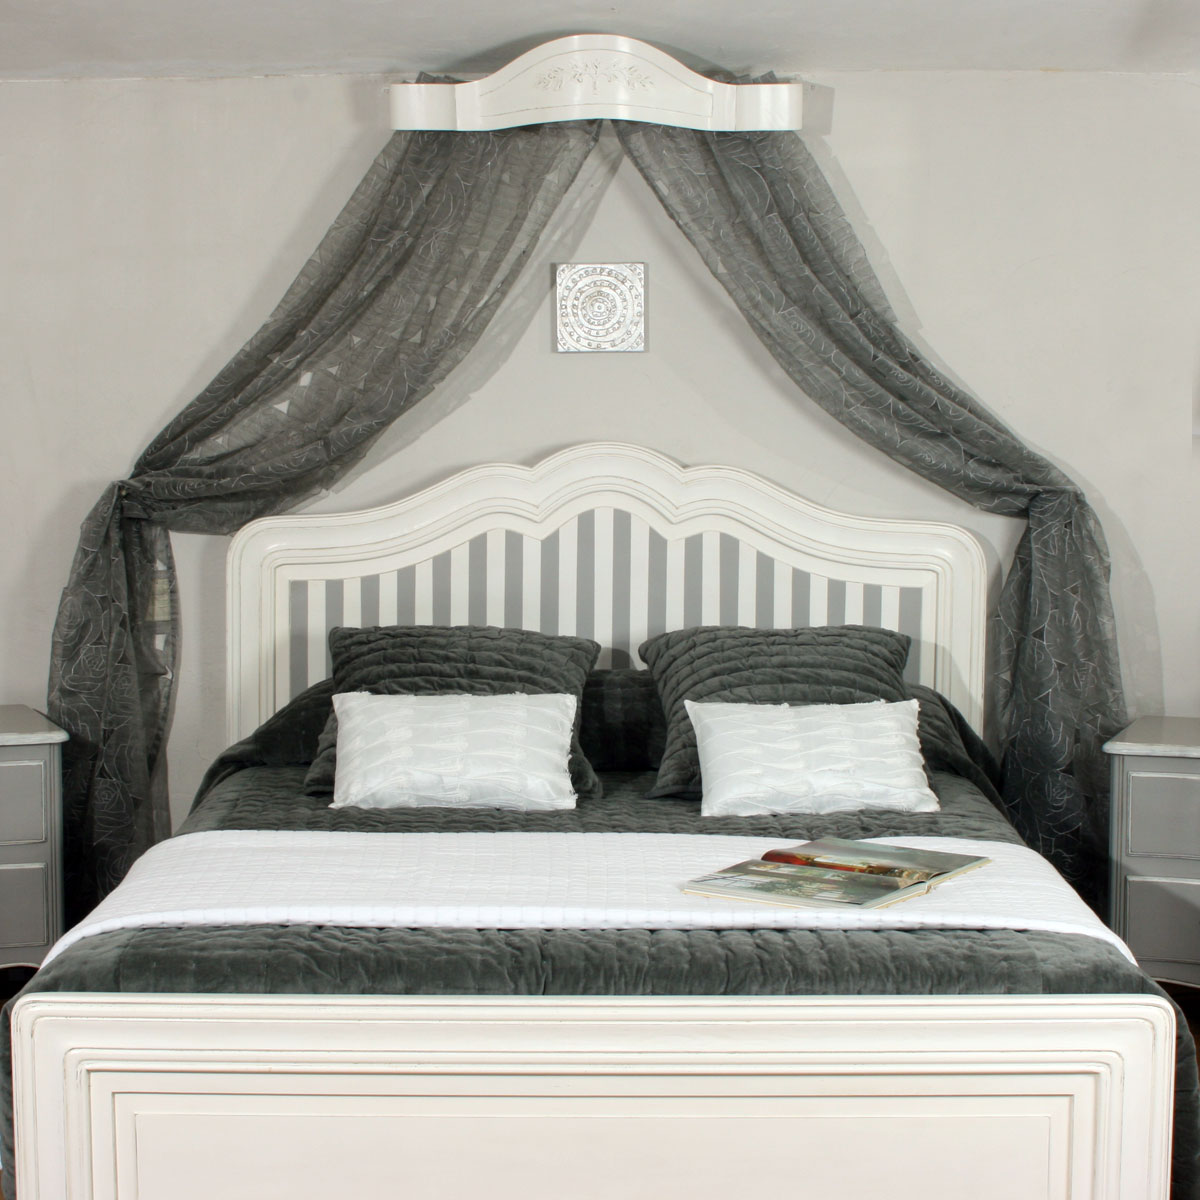 lit galb ref t154 l 39 atelier du moulin de provence. Black Bedroom Furniture Sets. Home Design Ideas